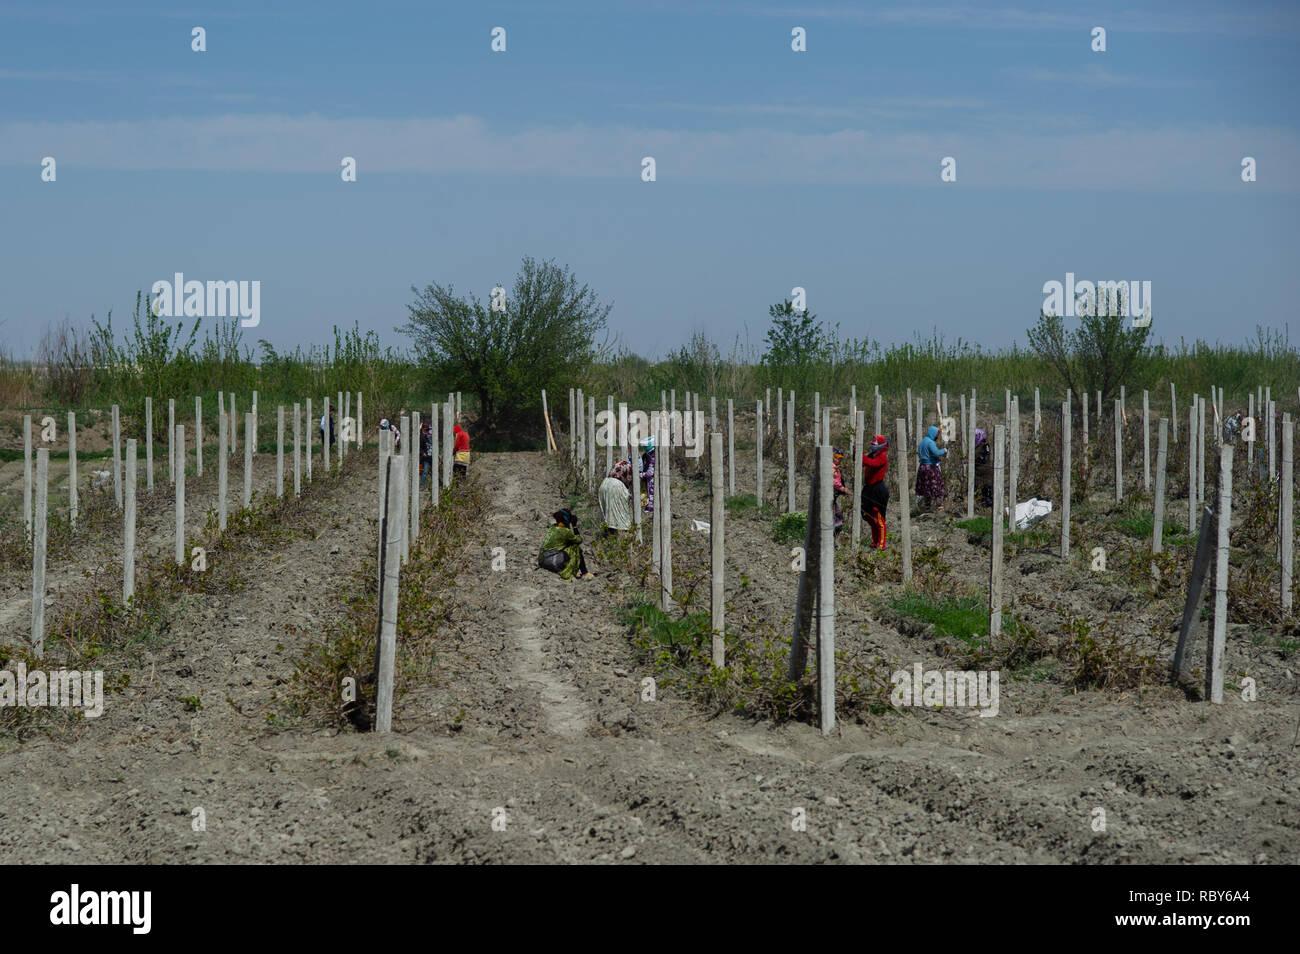 Uzbek farmers tend to roadside crops near Bukhara, Uzbekistan. Stock Photo